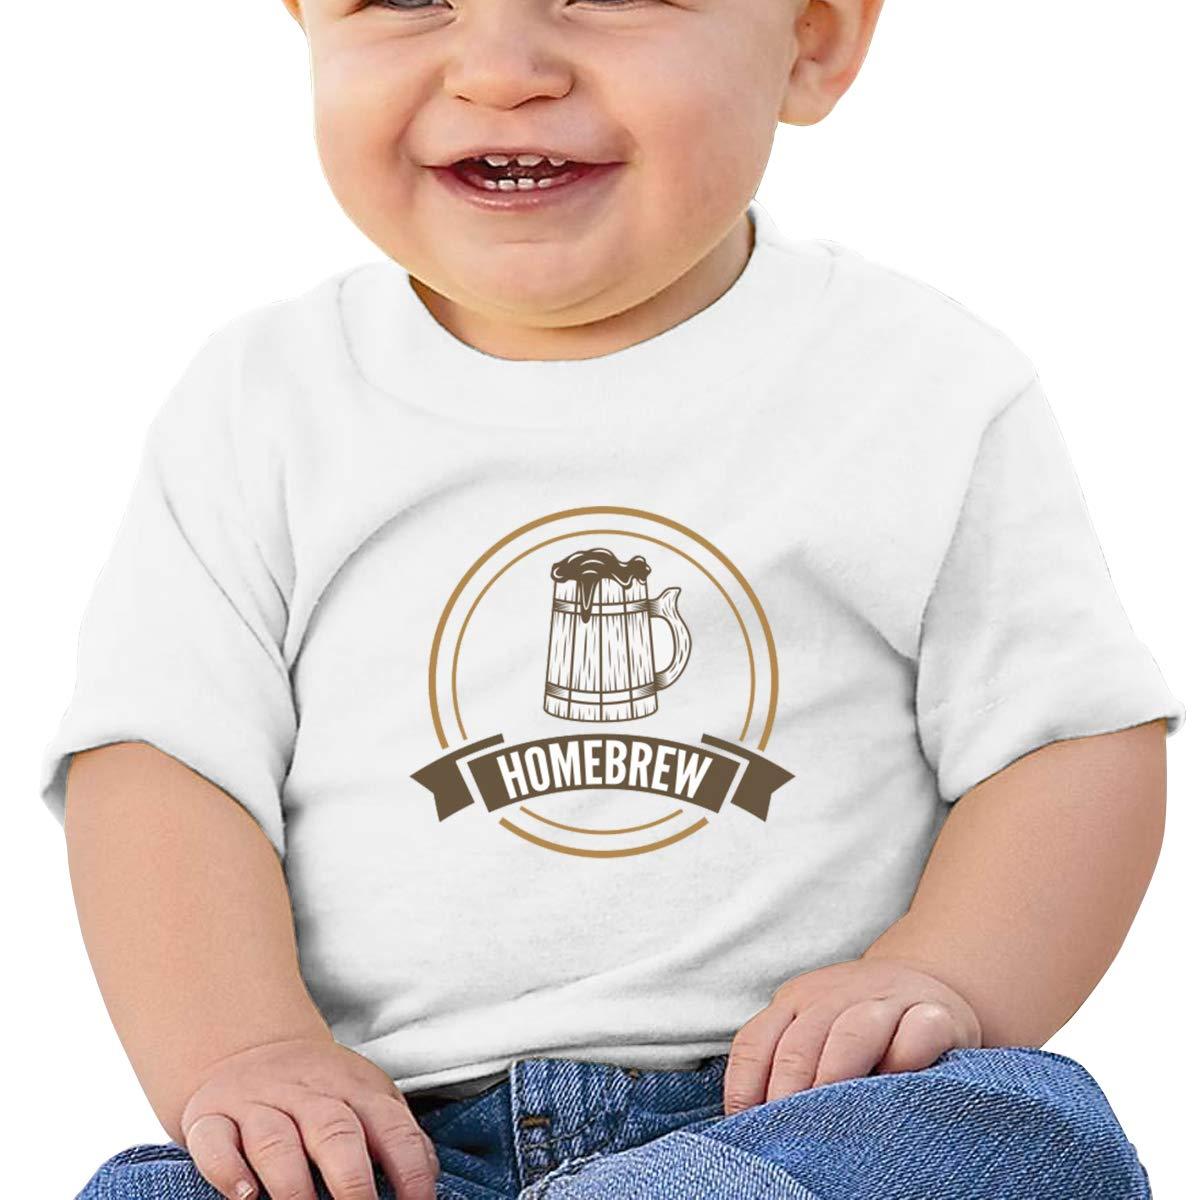 ShenigonHomebrew Toddler//Infant Short Sleeve Cotton T Shirts White 40